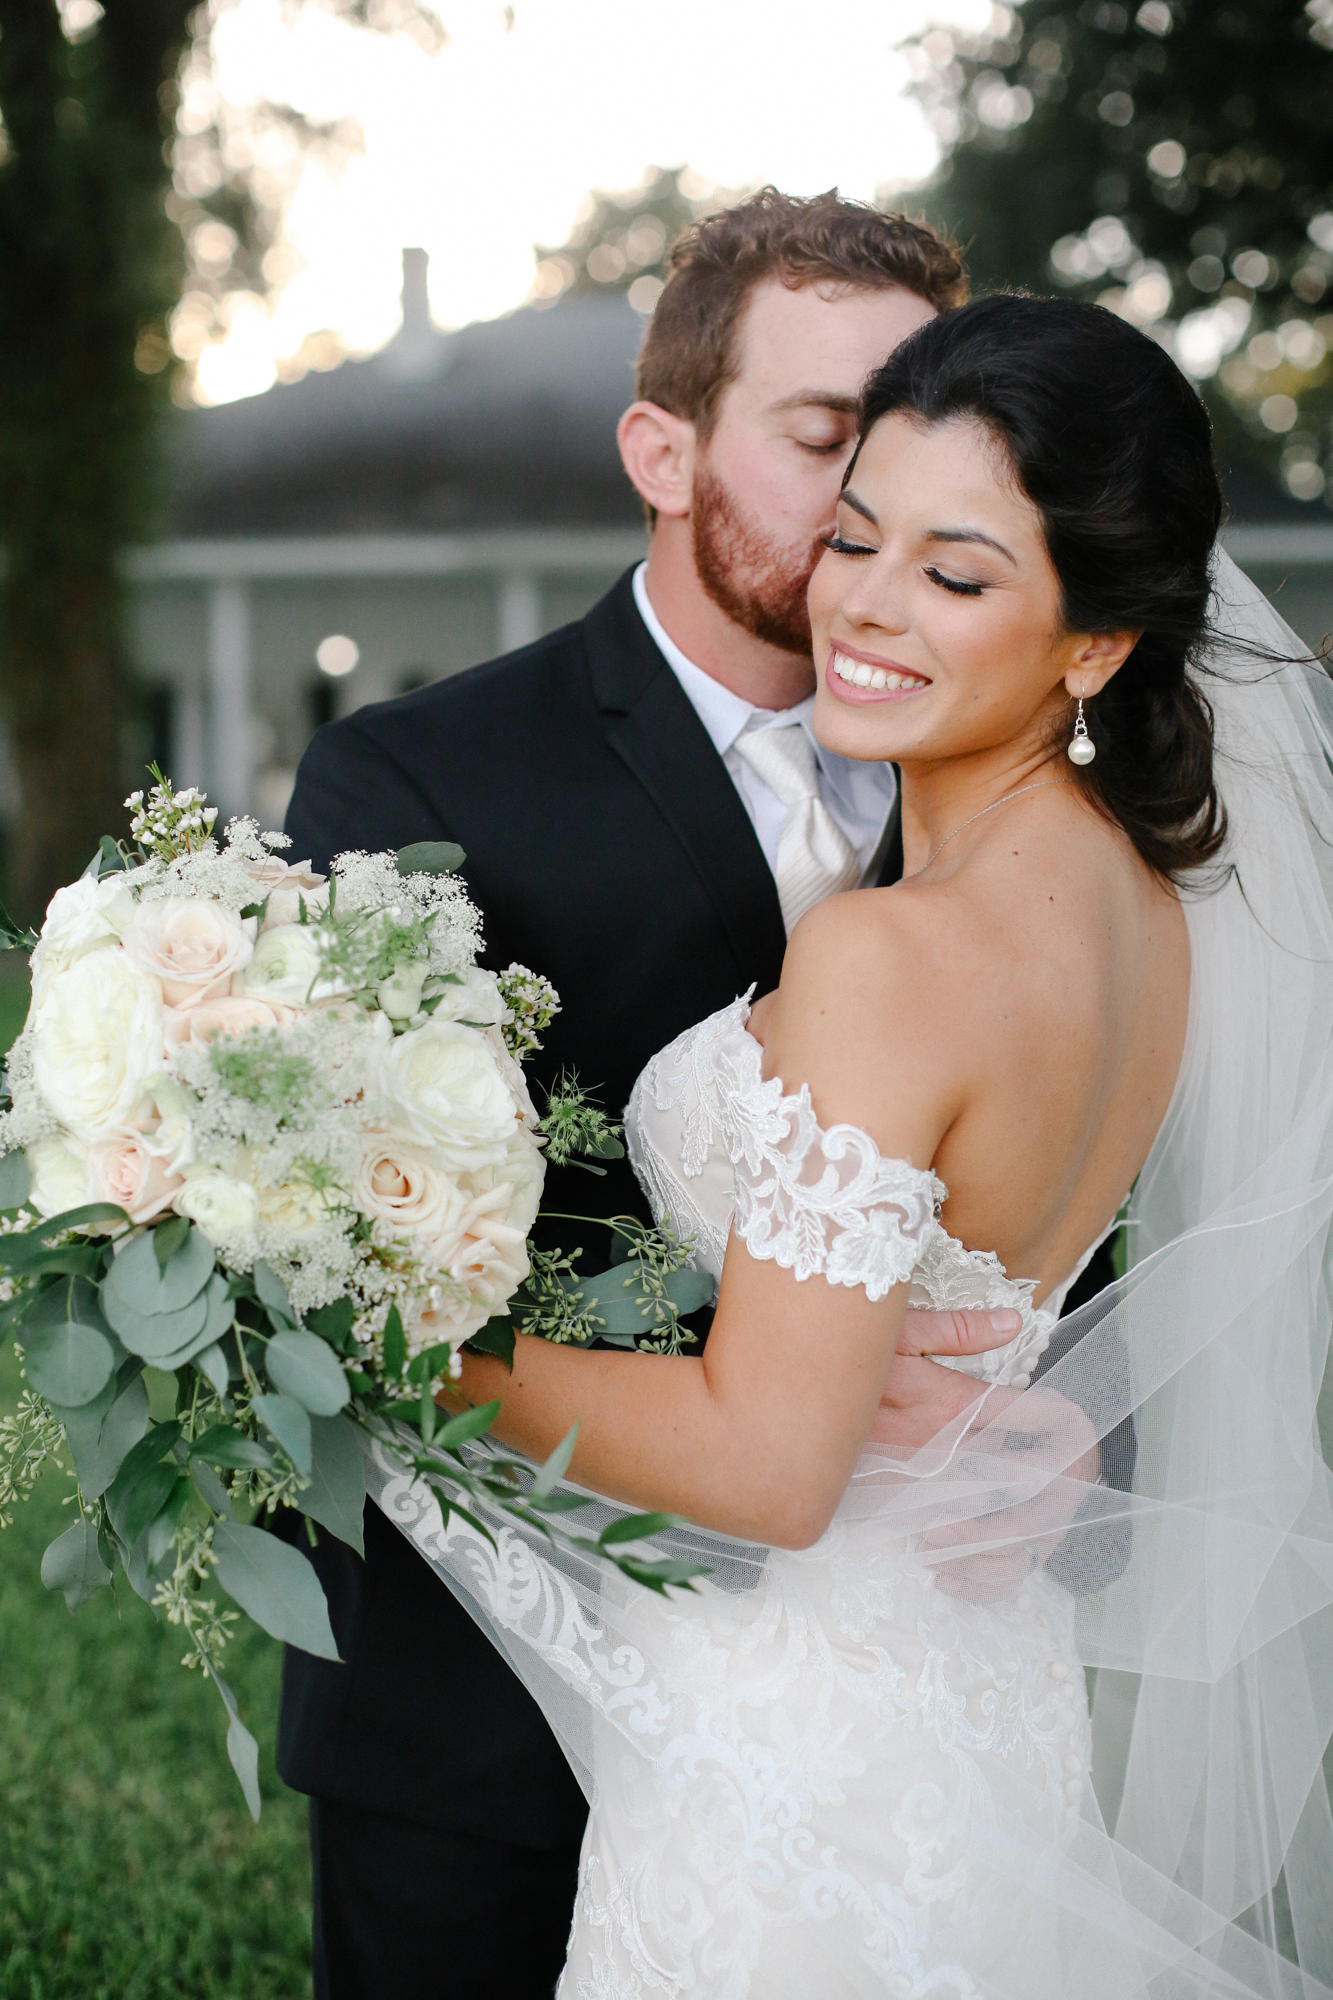 Gautier_Wedding_Photographer-152.jpg